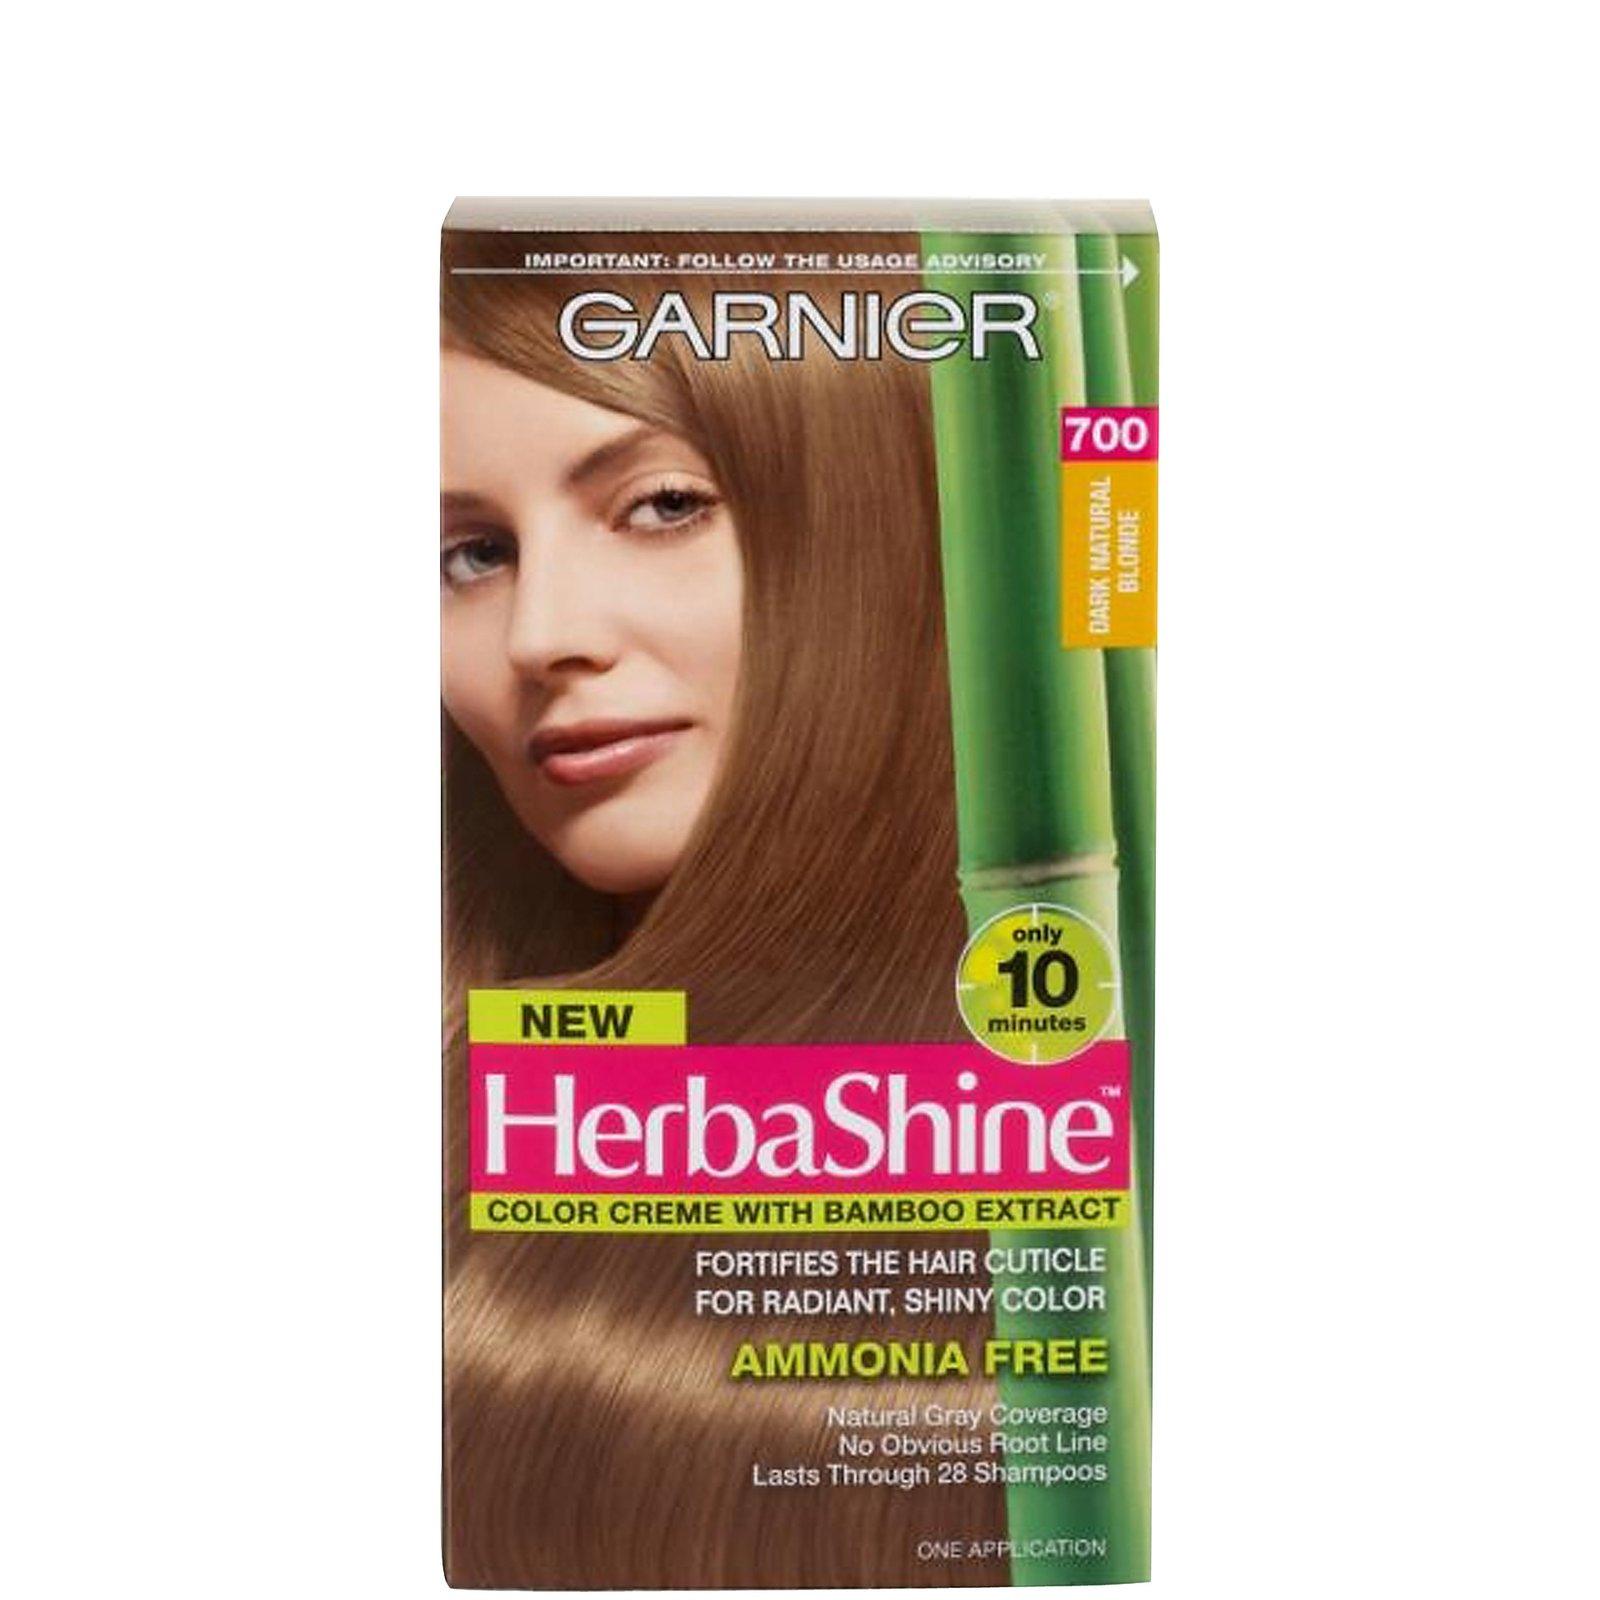 Cvs Garnier Hair Color Deal 49 Box My Crazy Savings